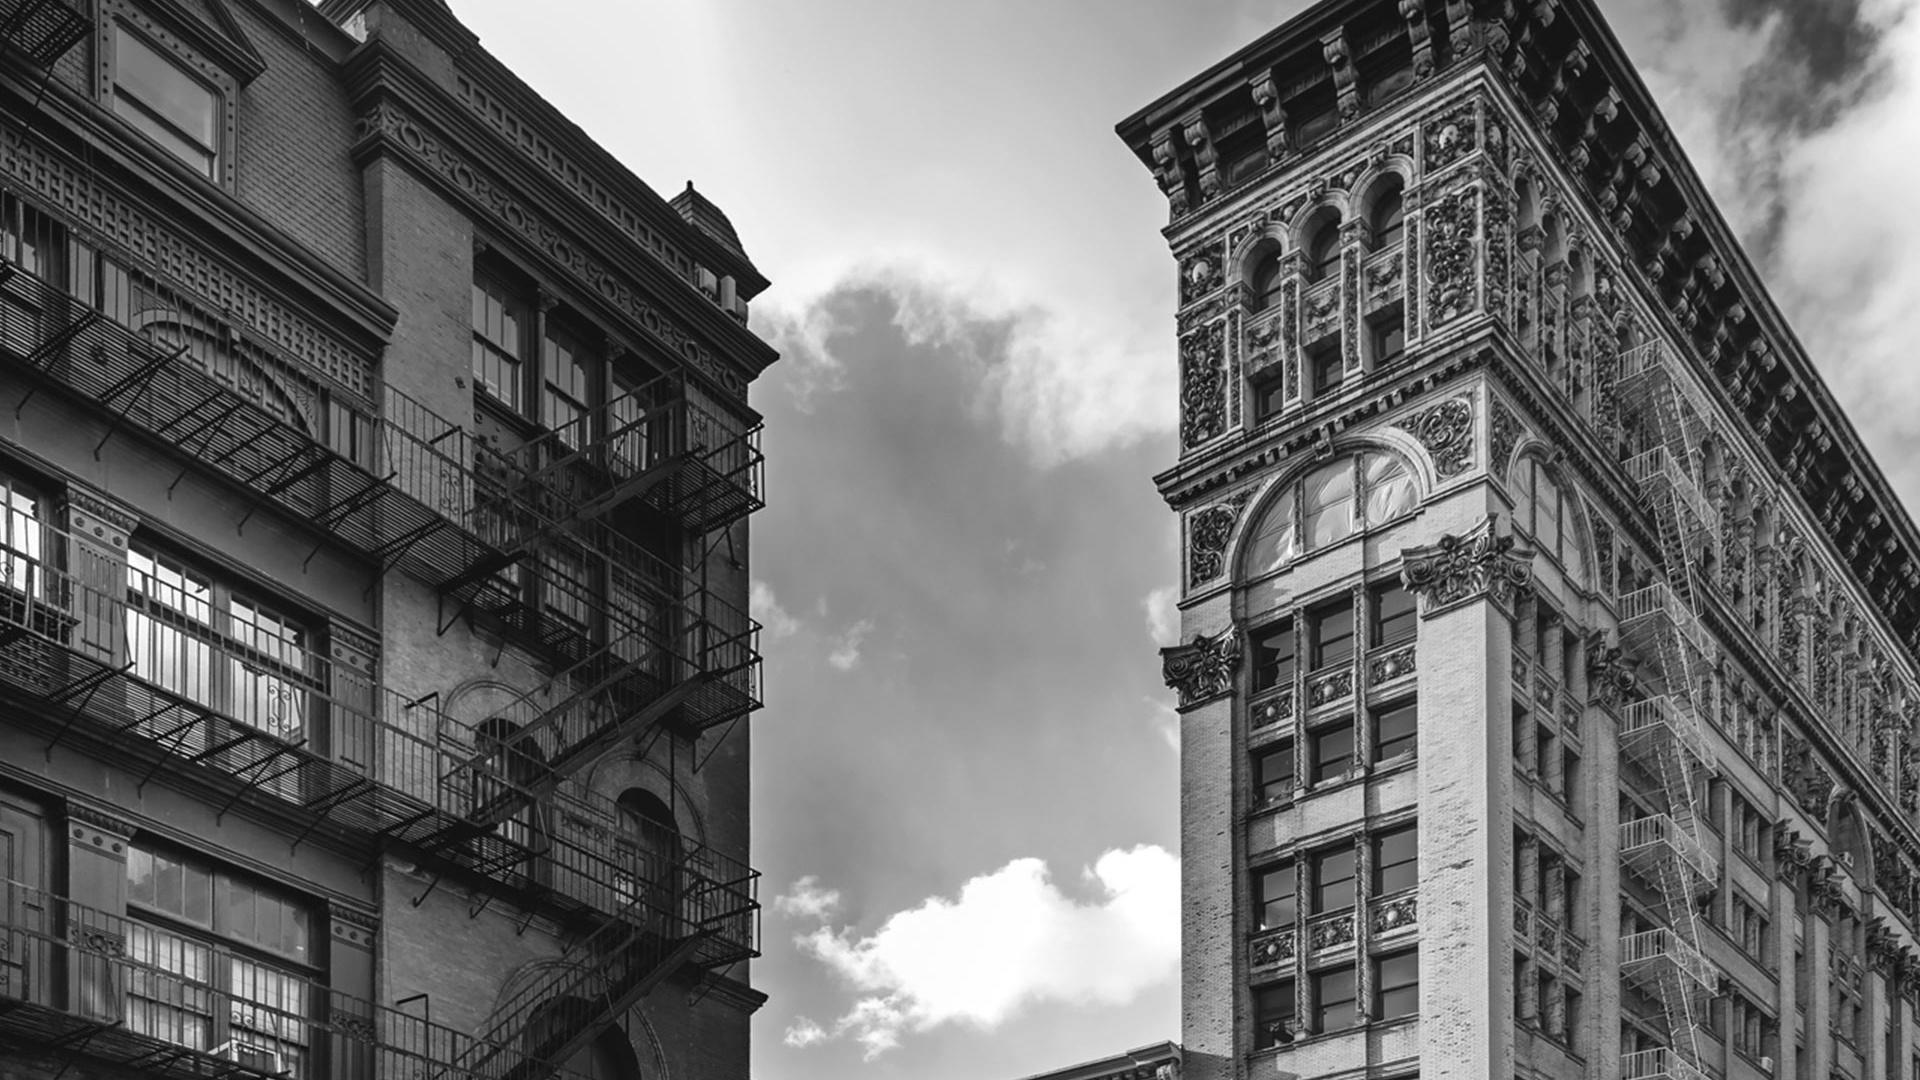 Eastside view, New York, by Serge Ramelli